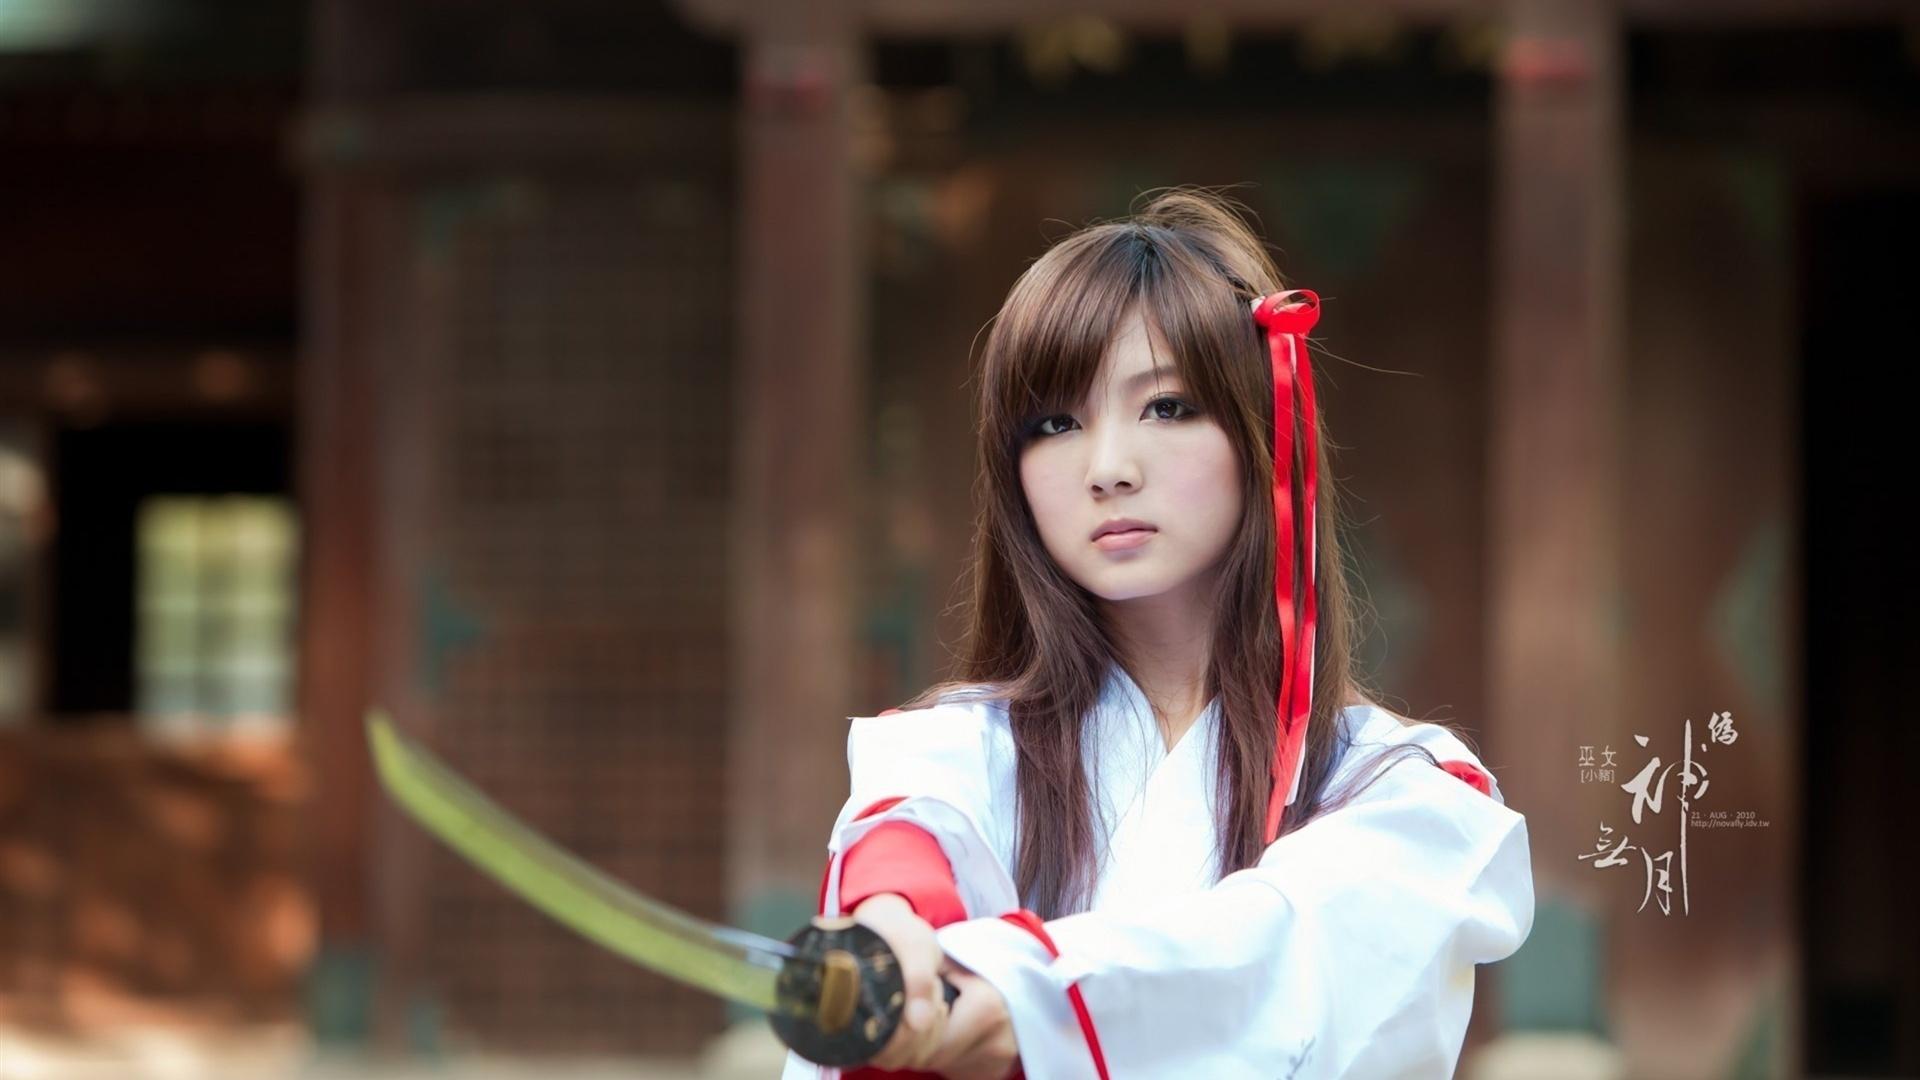 2560x1600 hd - Asian girl 4k ...